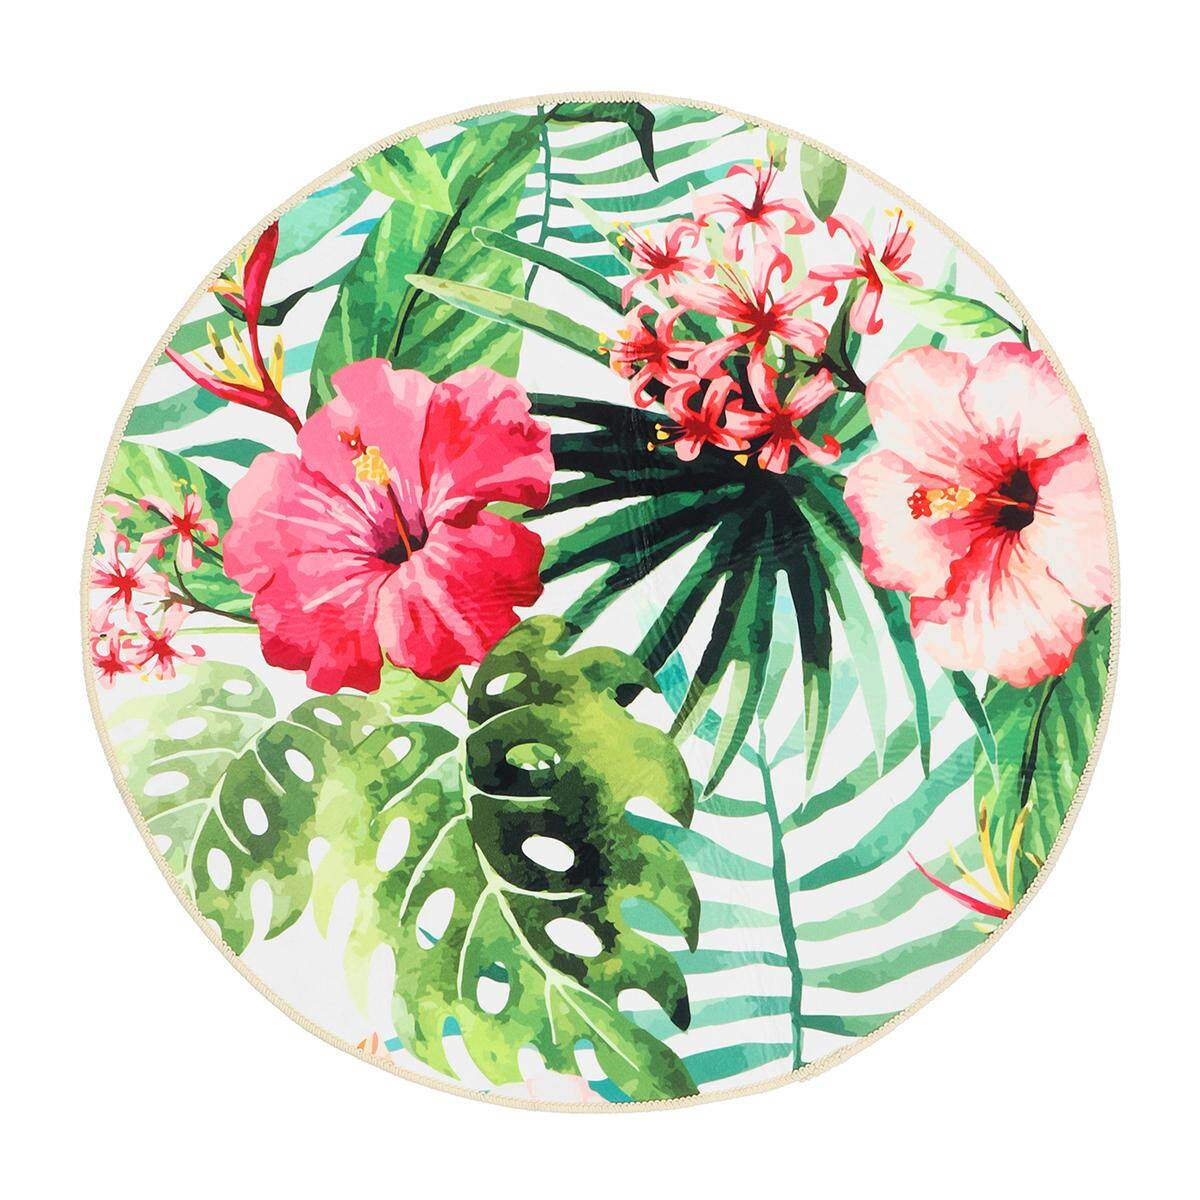 80cm Tropical Palm Leaves Floral Cactus Round Floor Mat Living Room Area Rugs Carpet